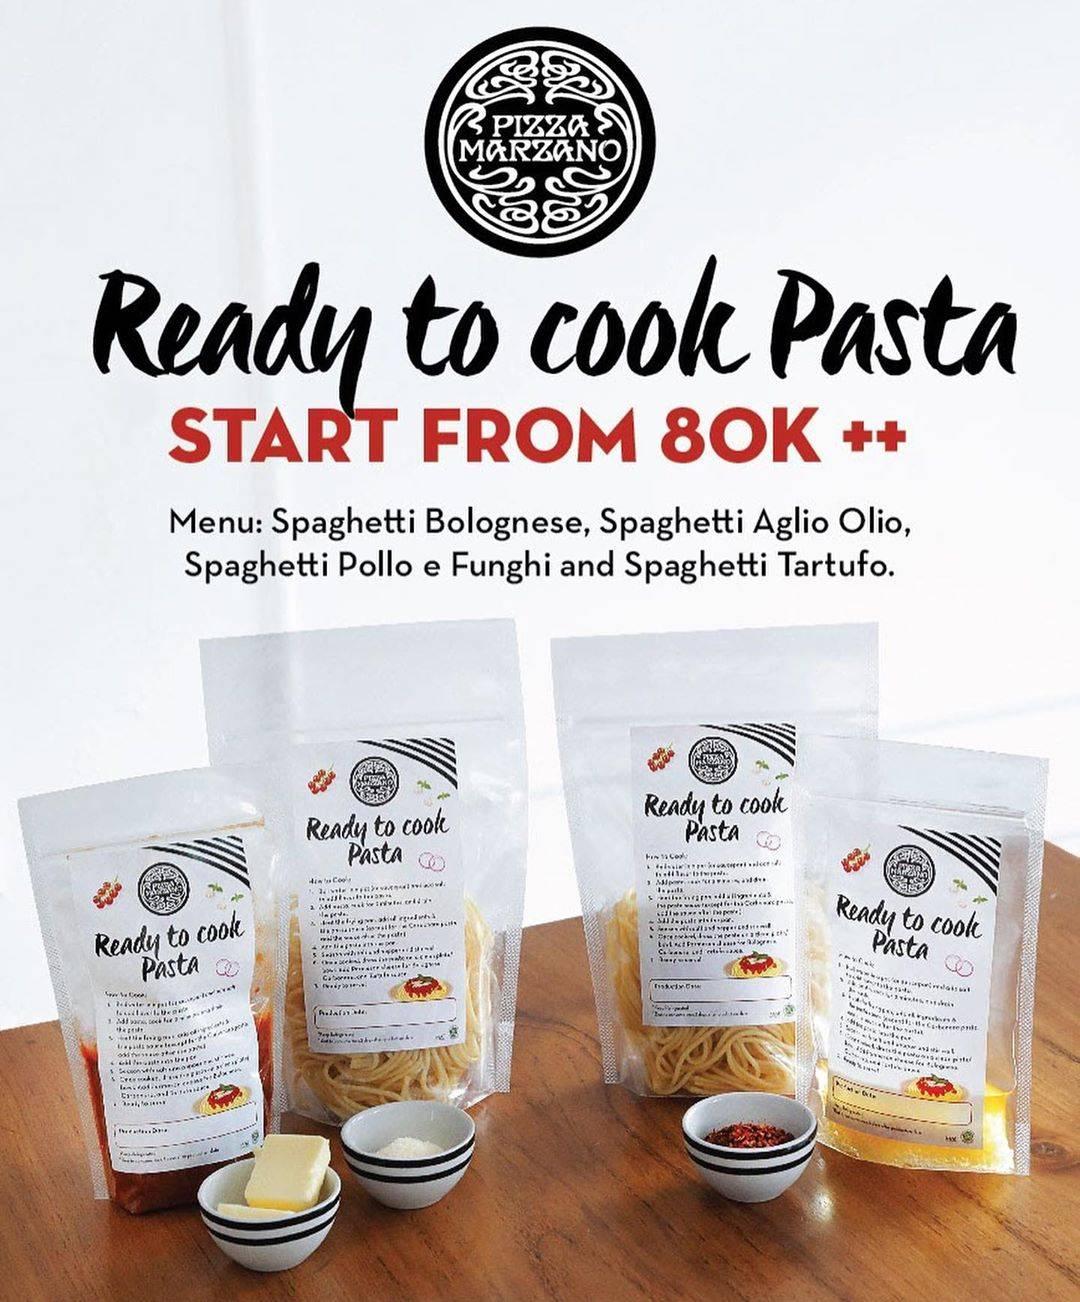 Diskon Pizza Marzano Promo Ready to Cook Pasta Mulai Rp. 80.000+